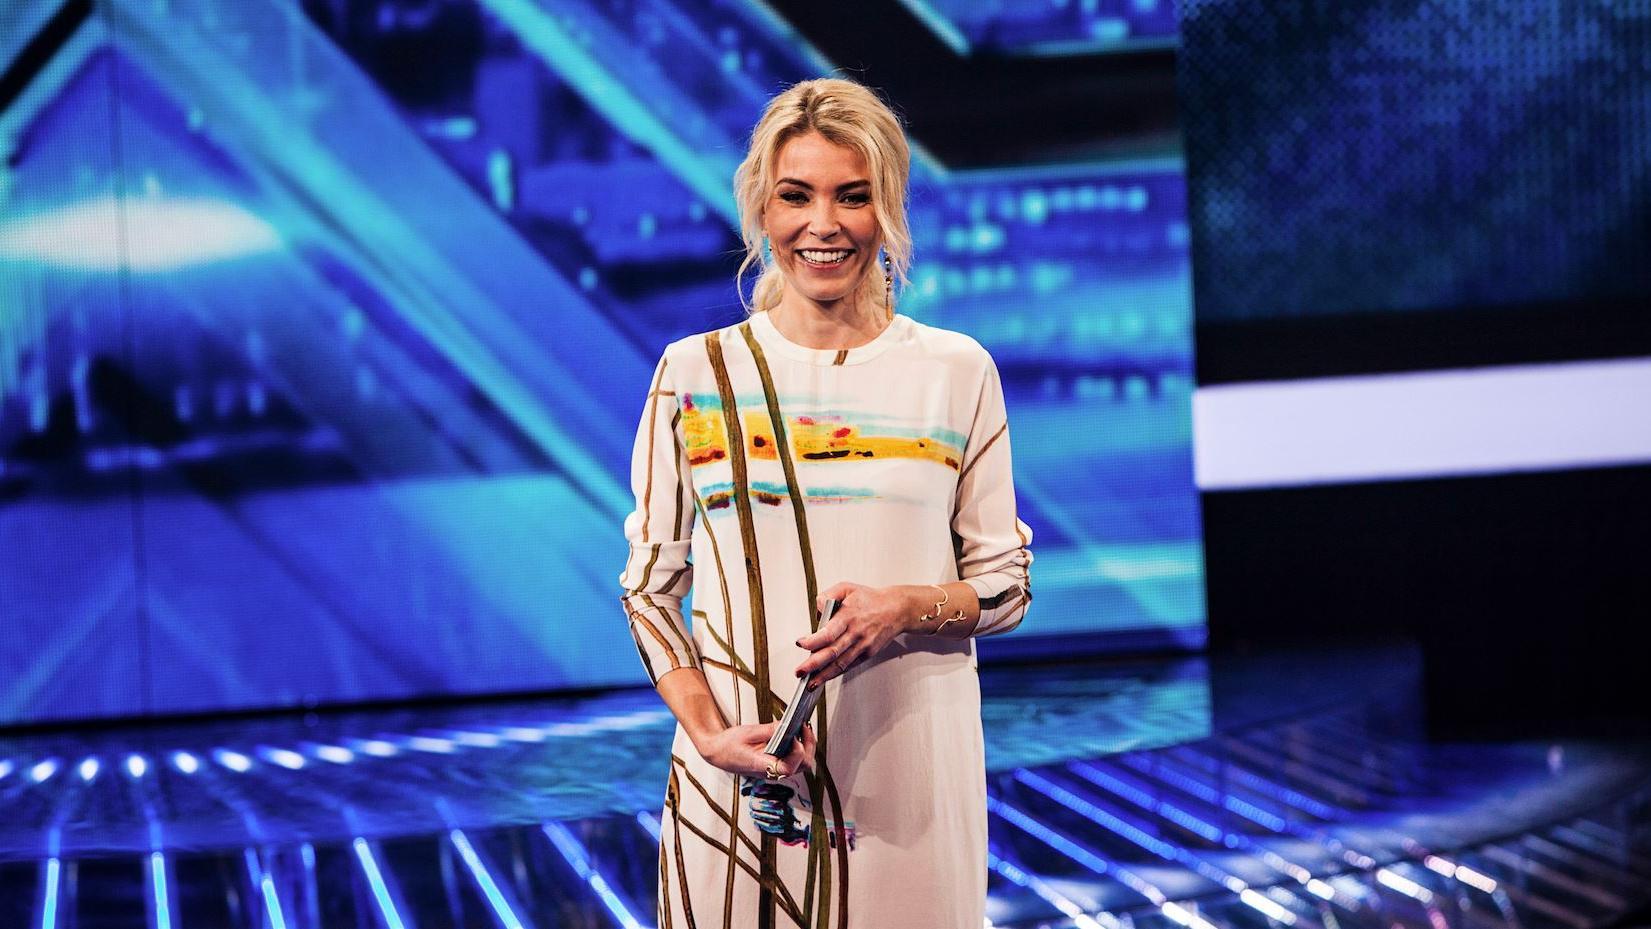 Eva Harlou X Factor 2015